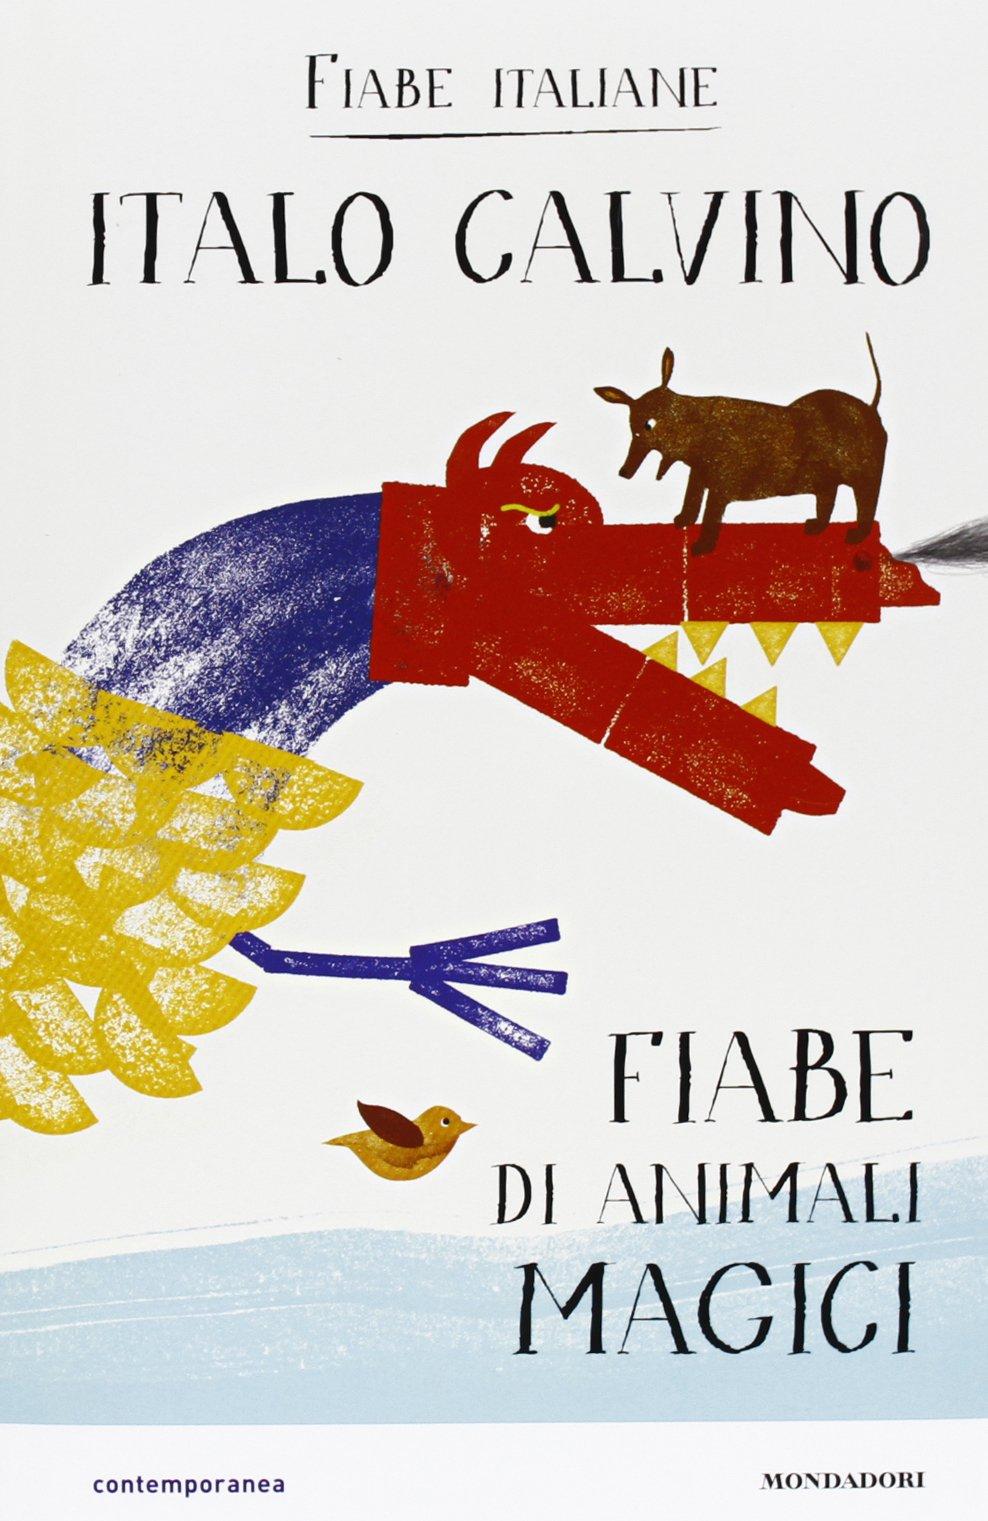 fiabe-di-animali-magici-fiabe-italiane